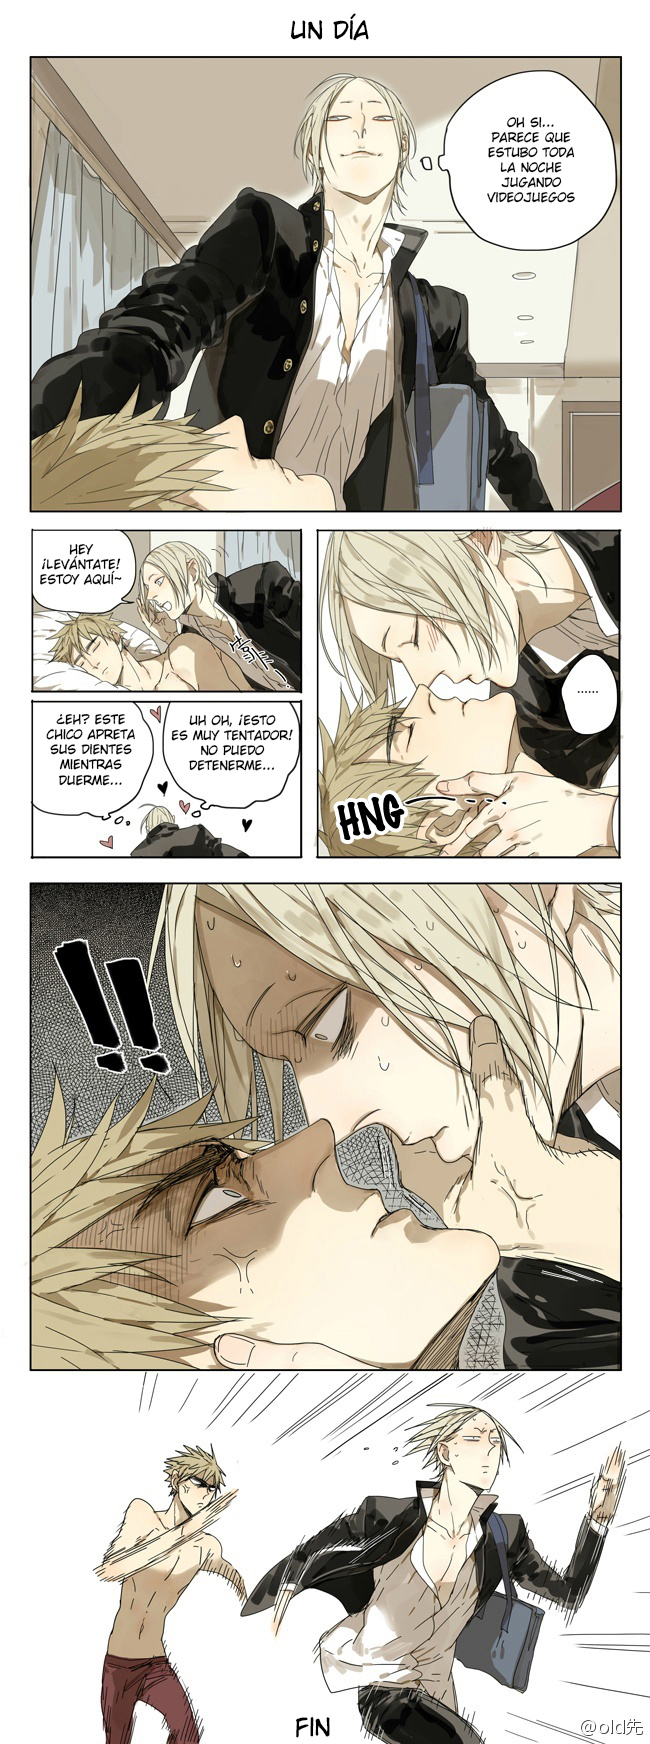 http://c5.ninemanga.com/es_manga/7/15943/381020/1b2576dc7715a014fc207453d1e52667.jpg Page 3